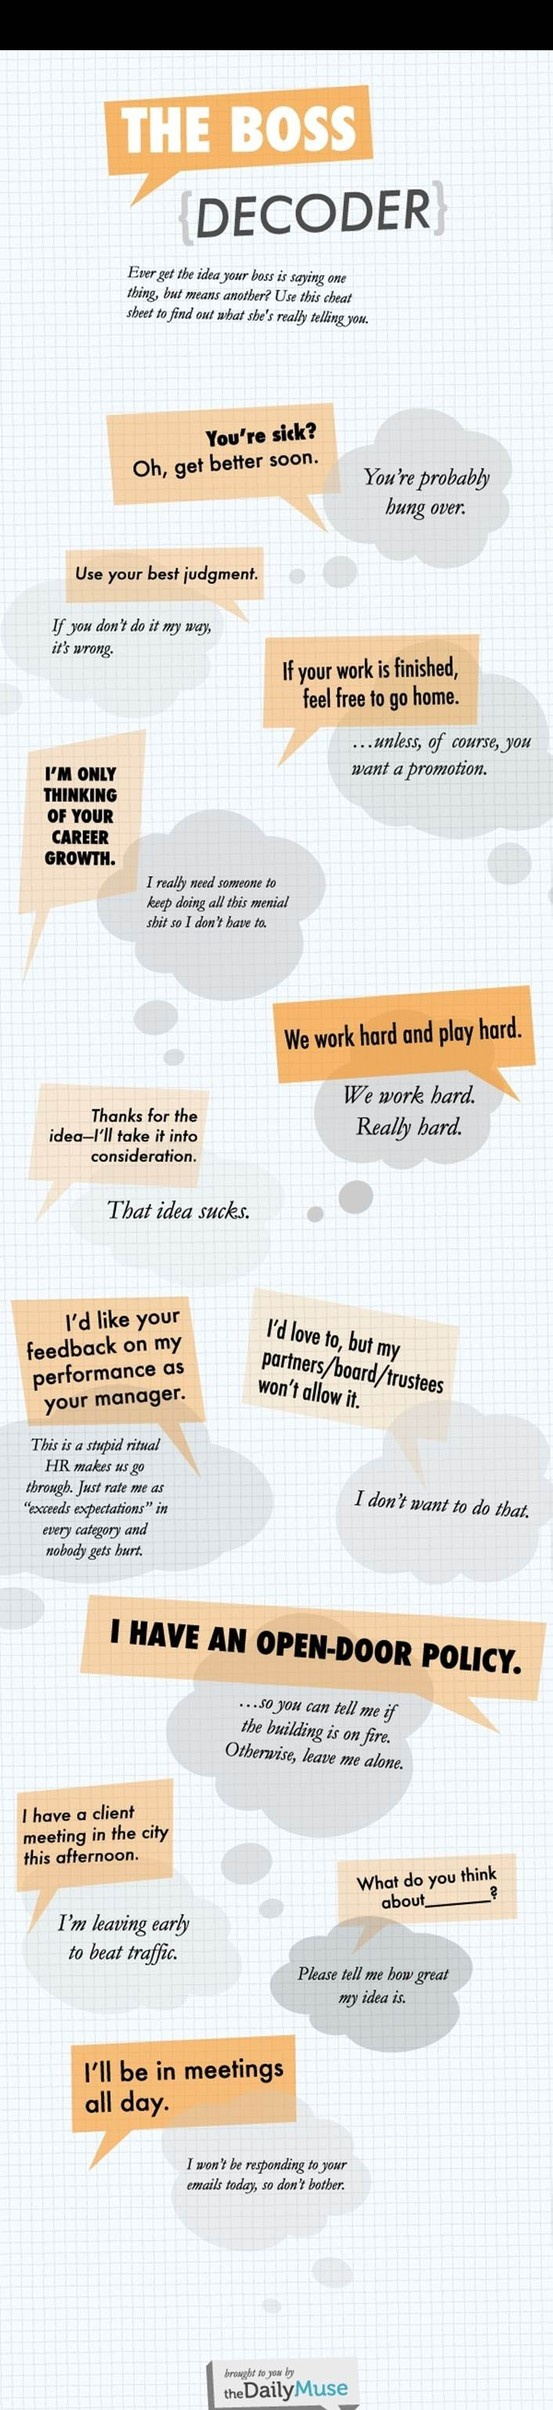 best idea board development images on pinterest fundraising